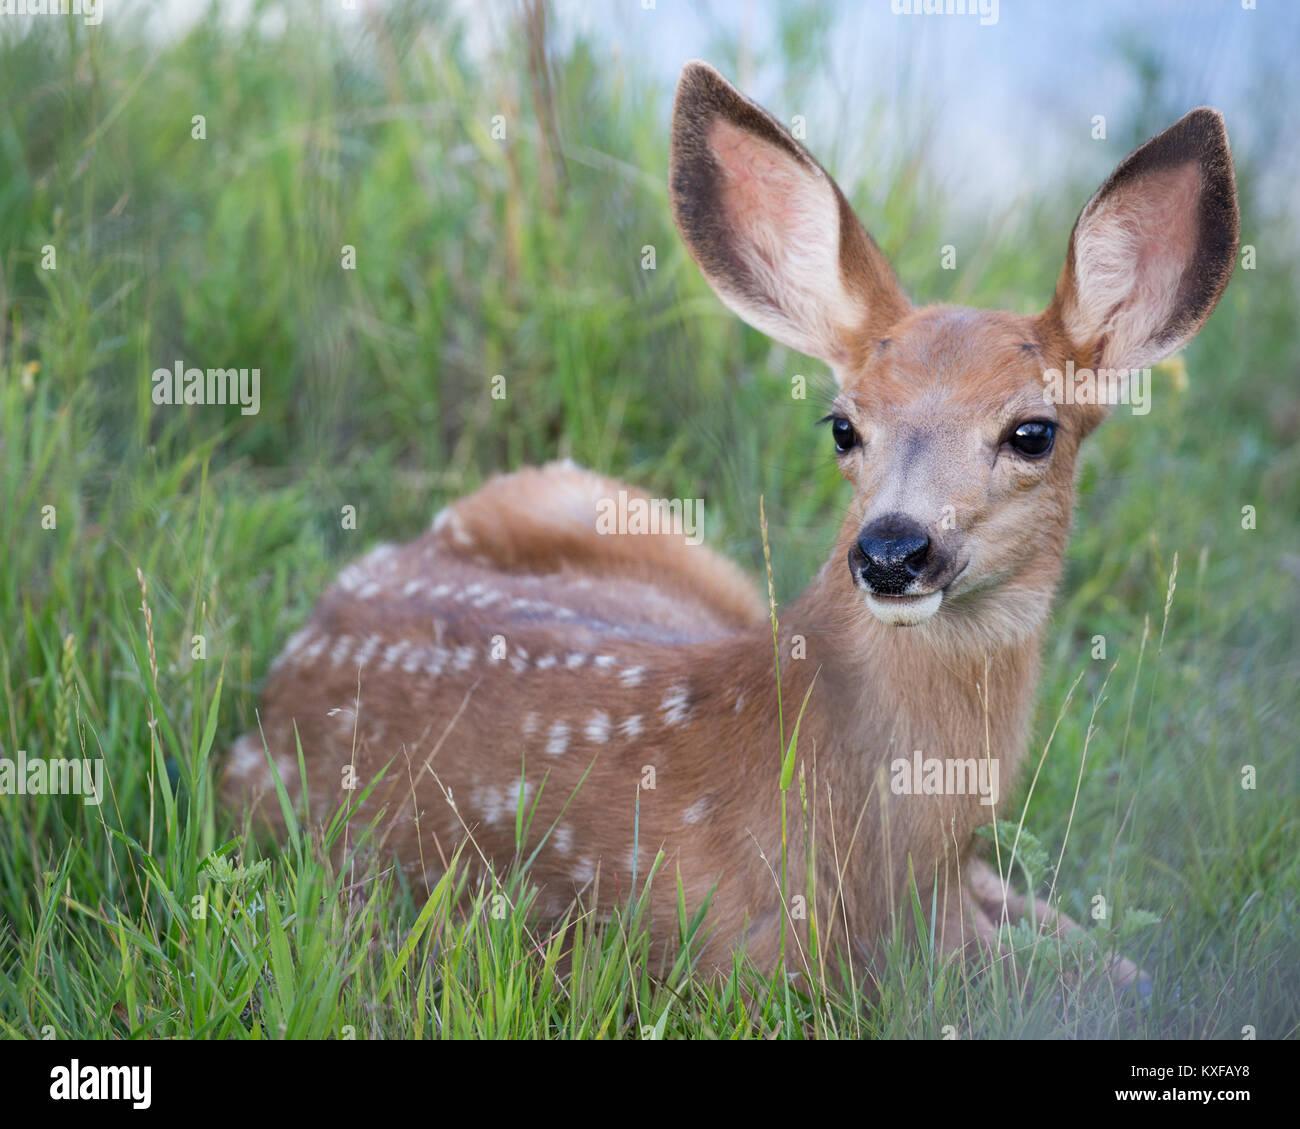 Mule Deer fawn (Odocoileus hemionus) - Stock Image